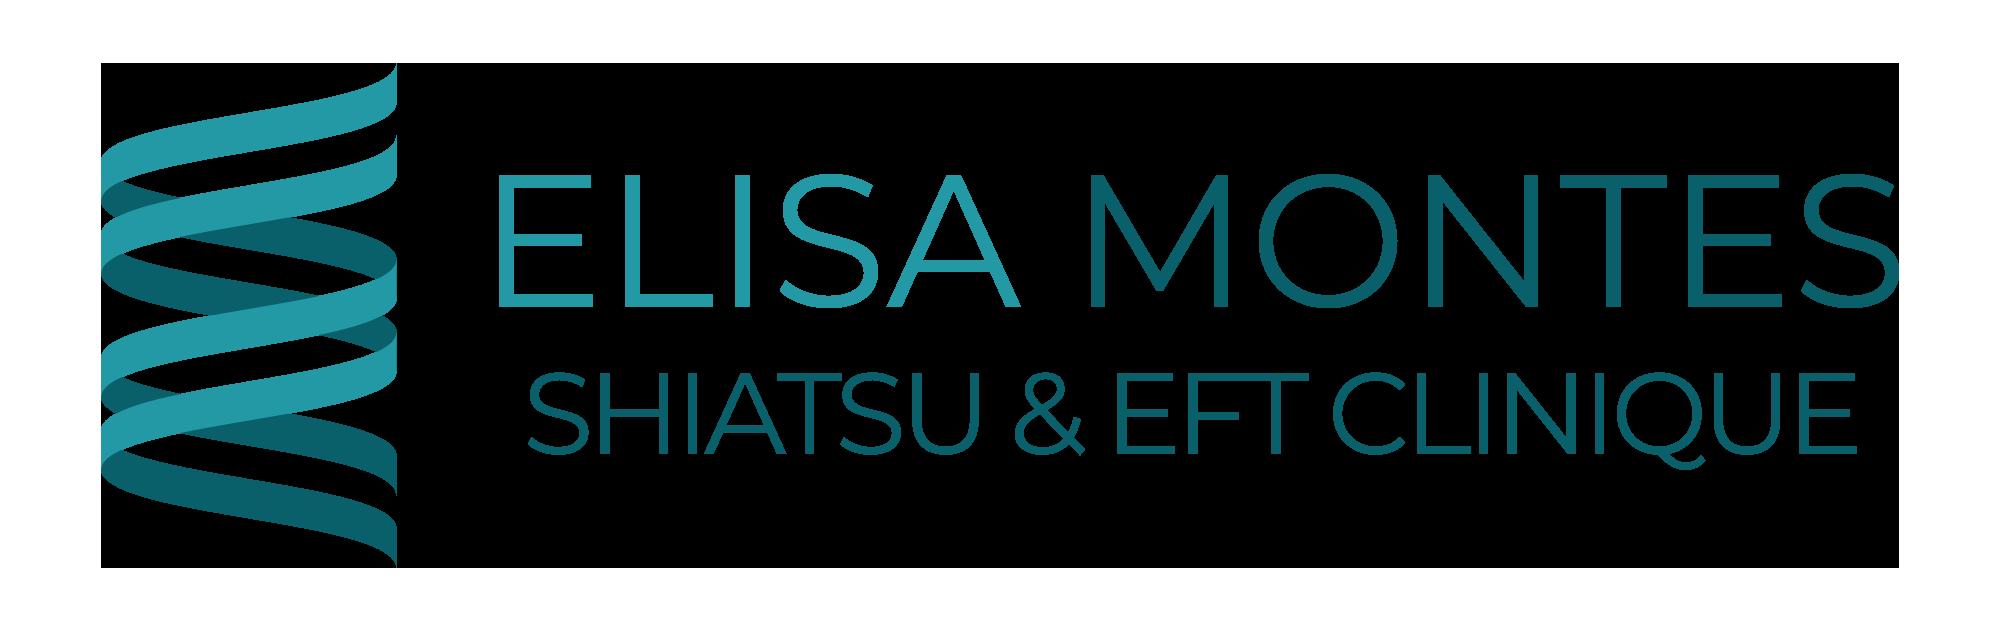 Elisa Montes